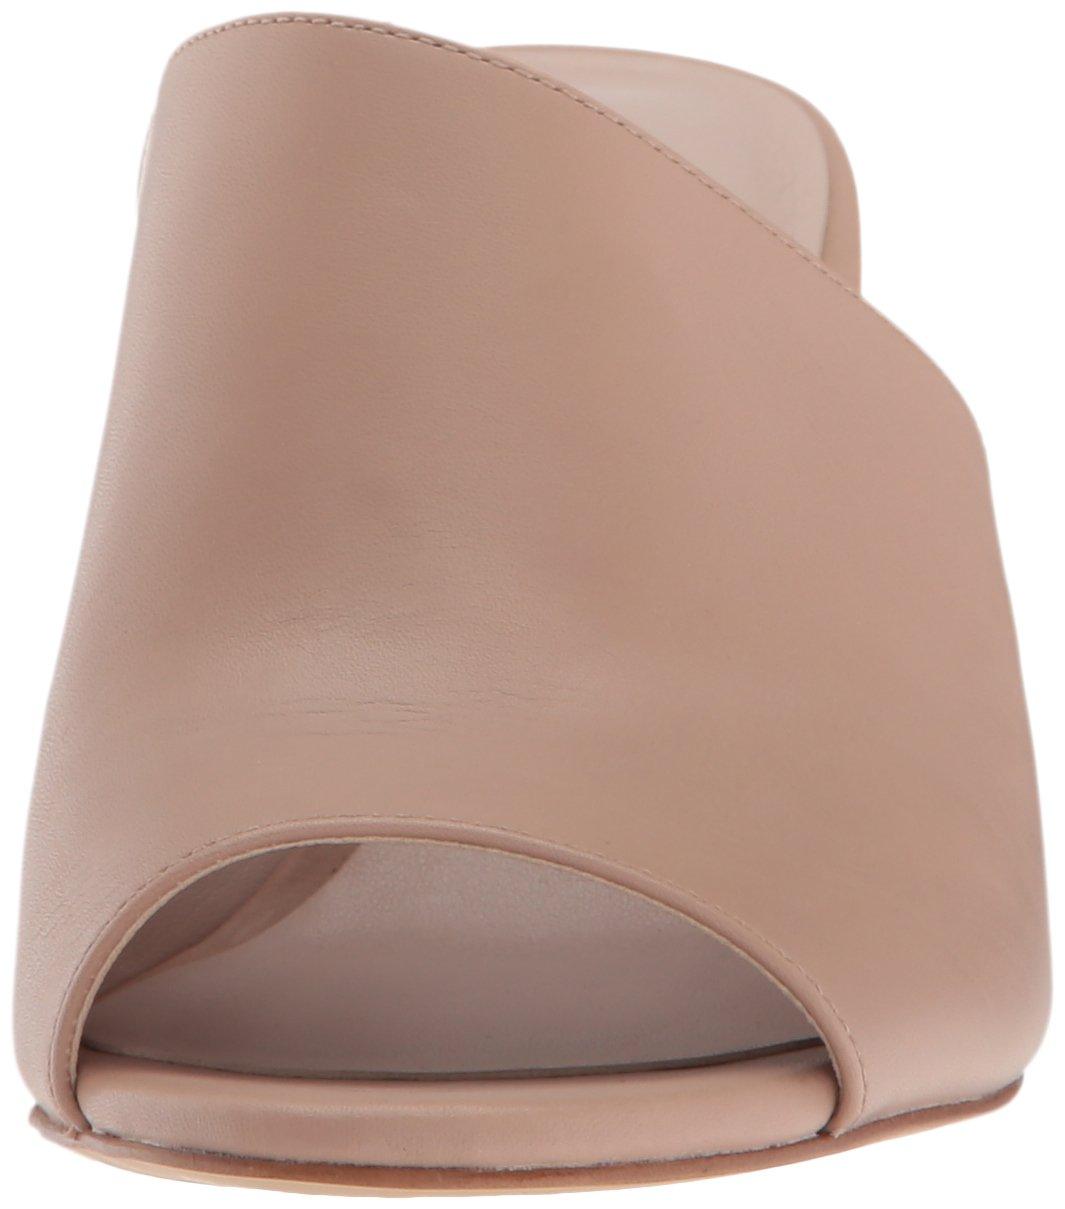 Nine West B079P7KHQ4 Women's Janissah Slide Sandal B079P7KHQ4 West 10.5 B(M) US|Light Natural Leather 233989